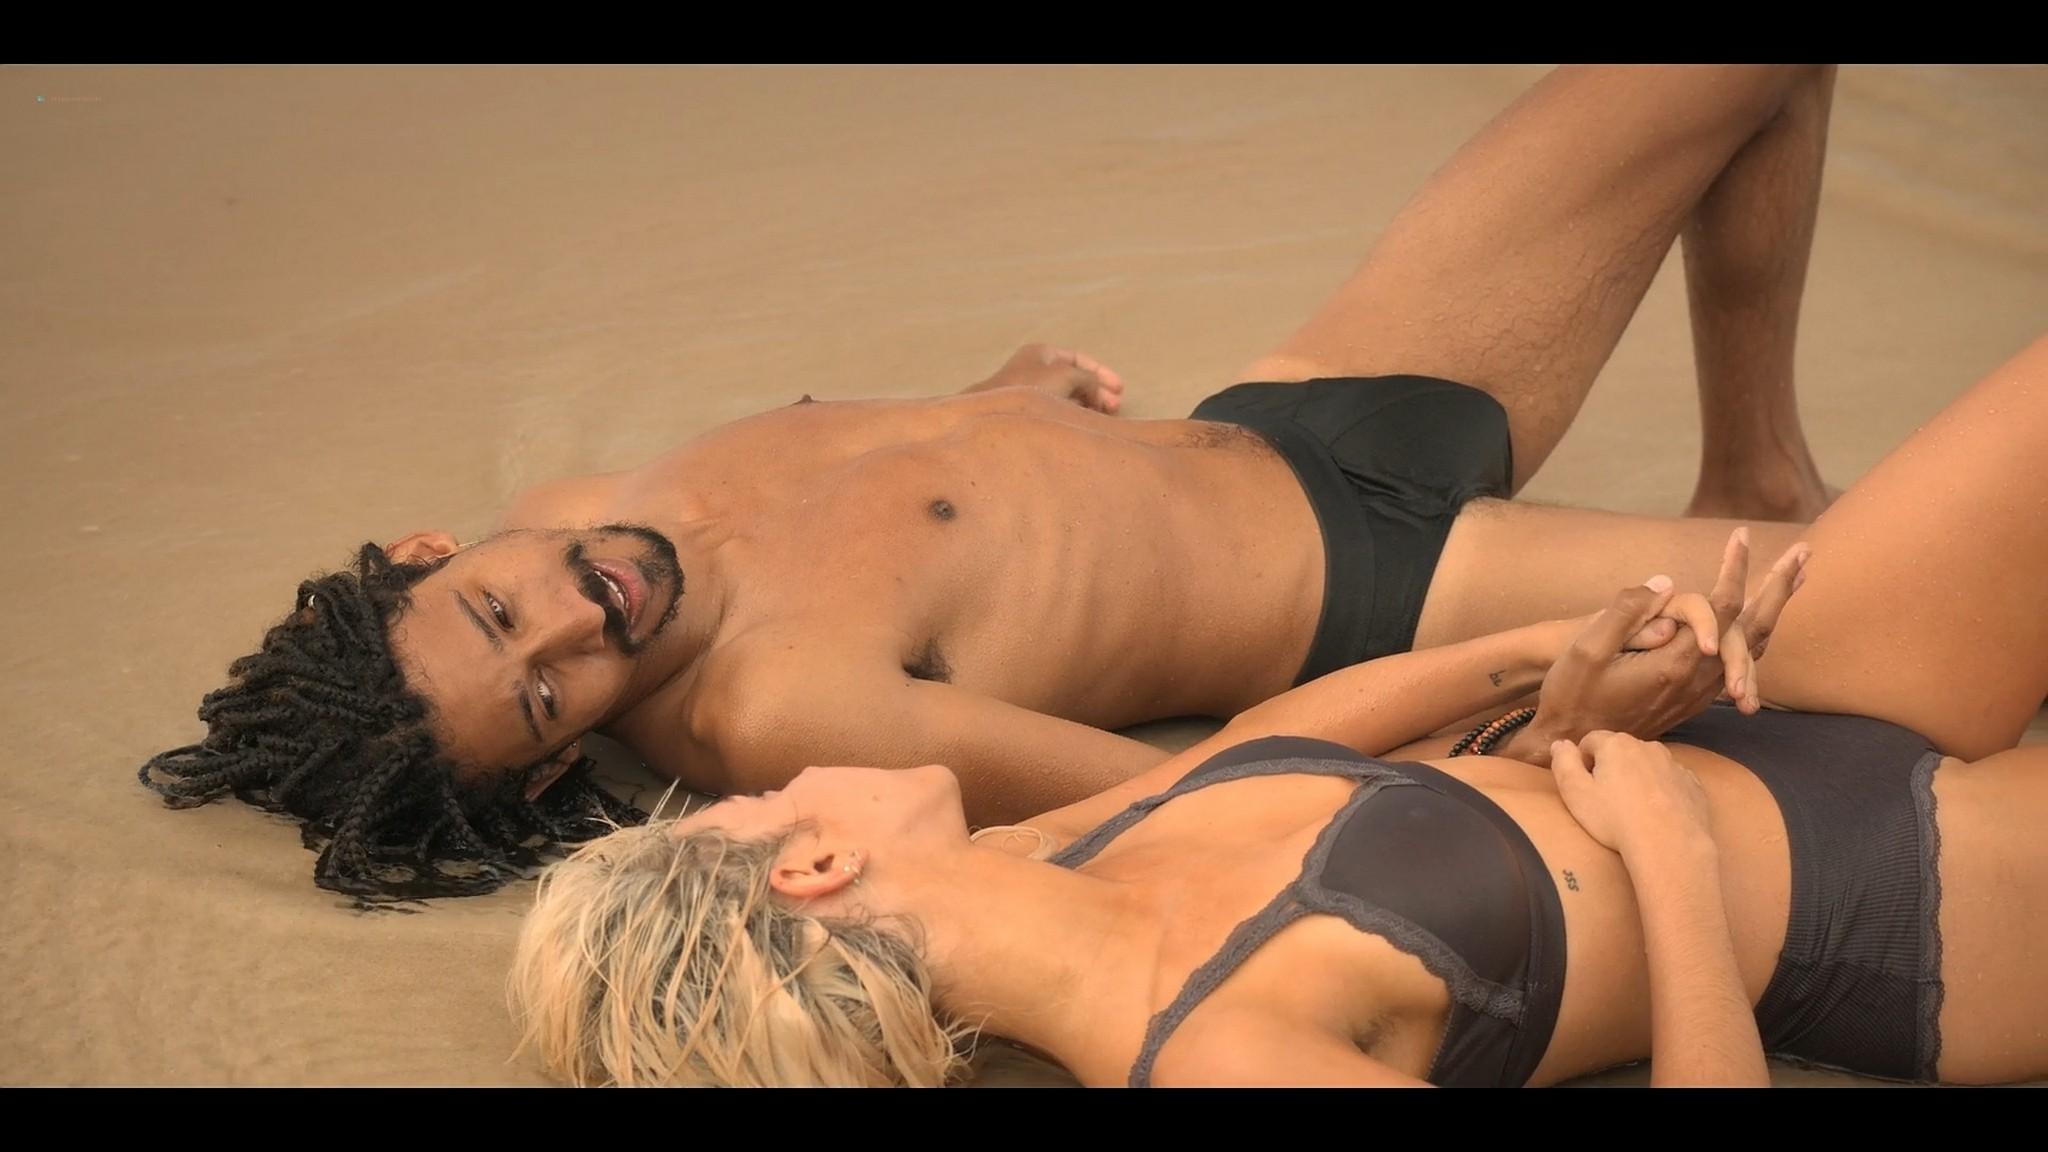 BeBe Bettencourt sexy Sophie Wilde Priscilla Doueihy hot lesbian sex Eden AU 2021 s1e4 8 1080p Web 7